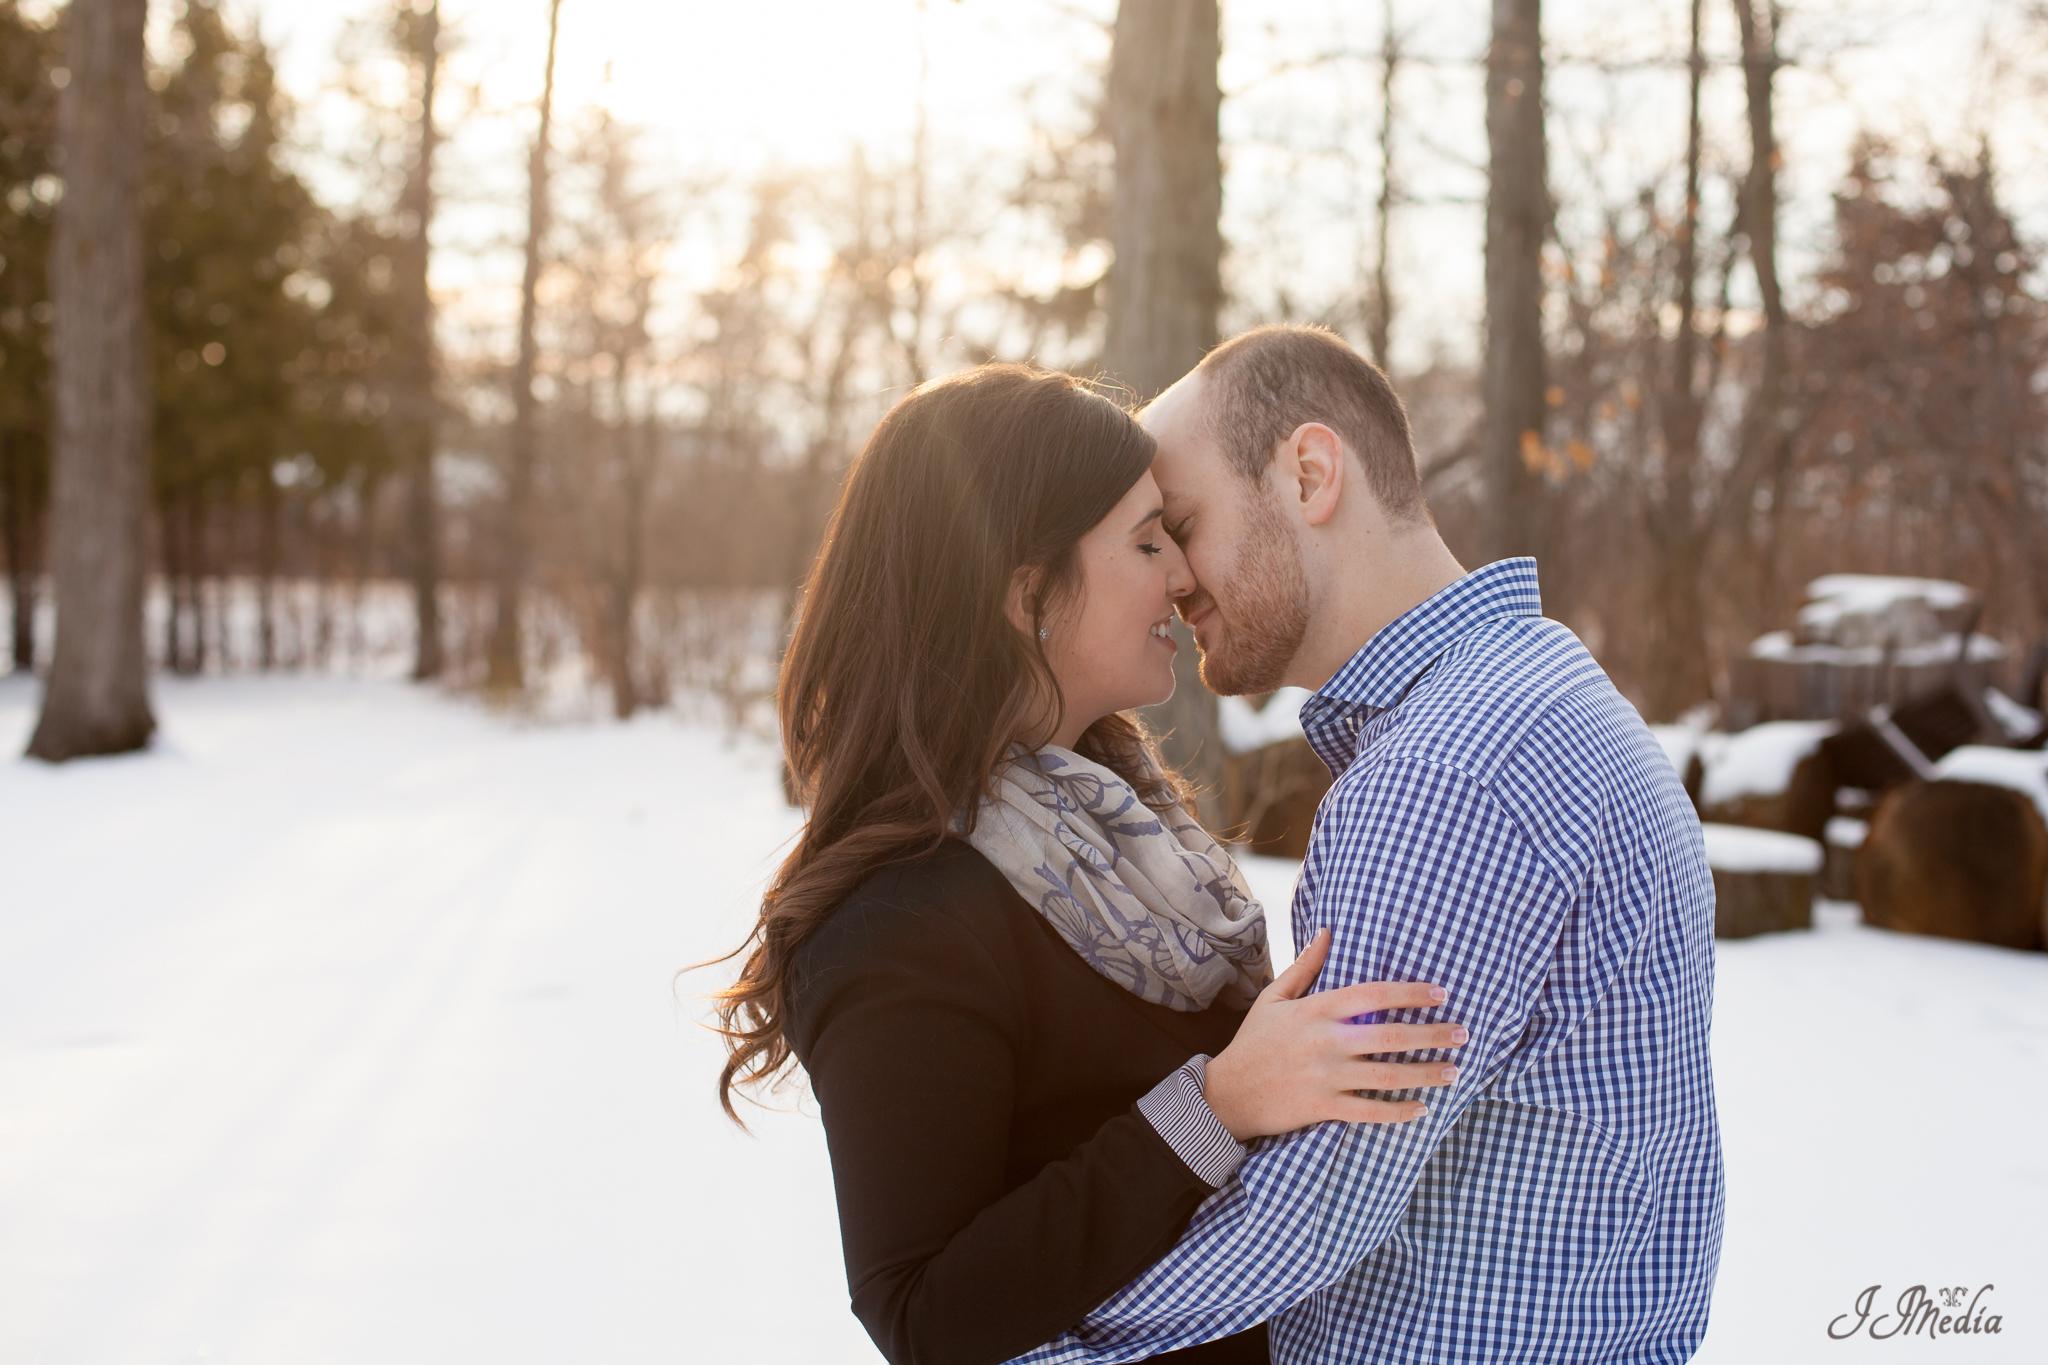 Winter-Engagement-Photos-JJMedia-21